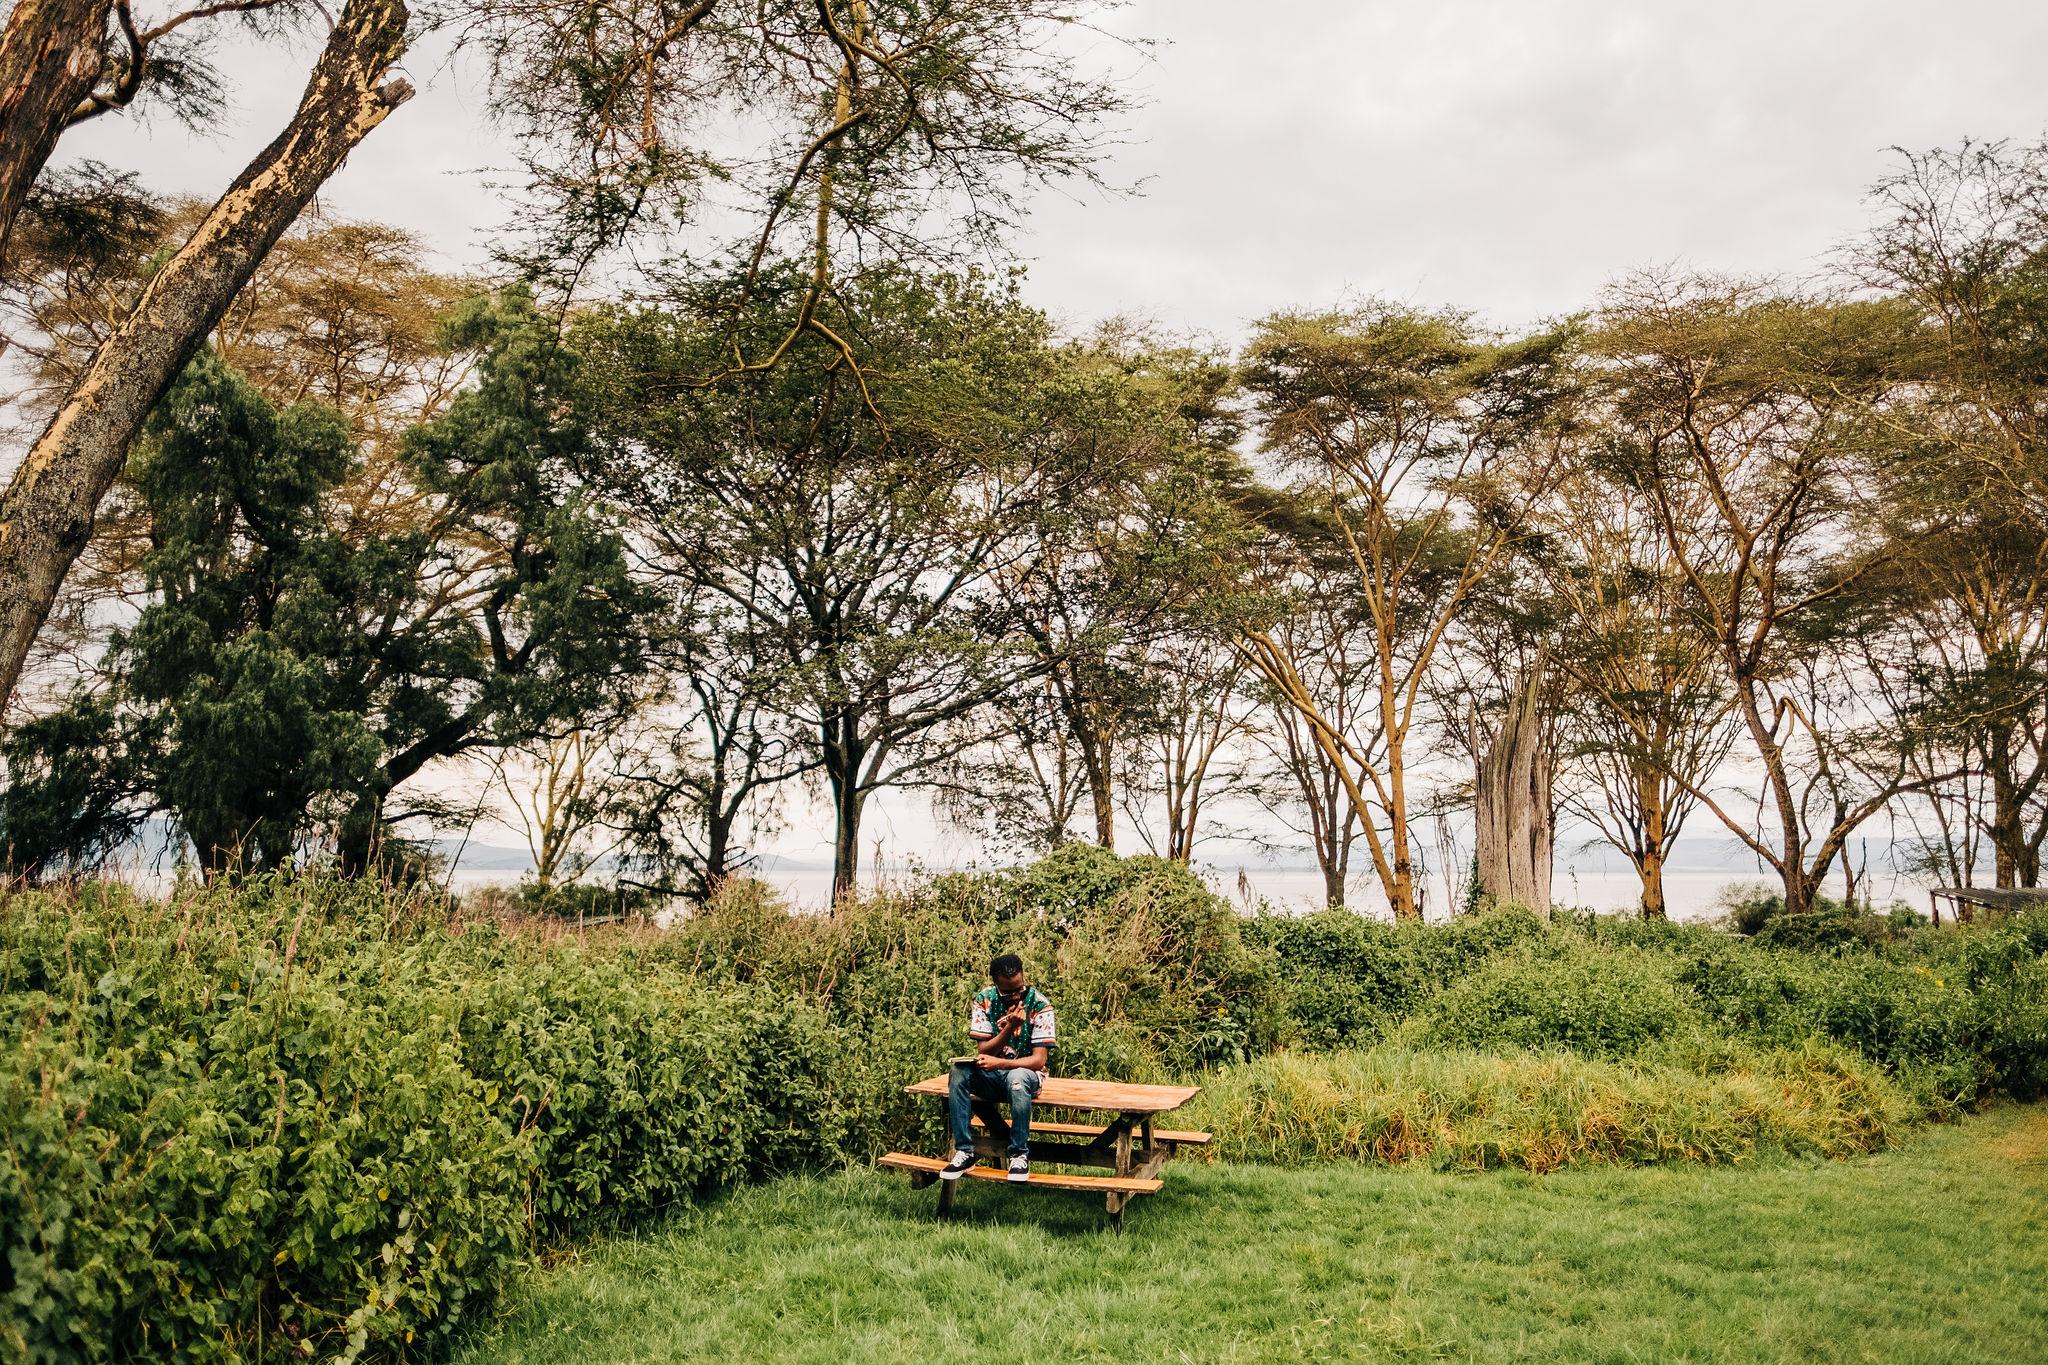 Anna-Hari-Photography-Destination-Wedding-Photographer-Kenya-14.jpg